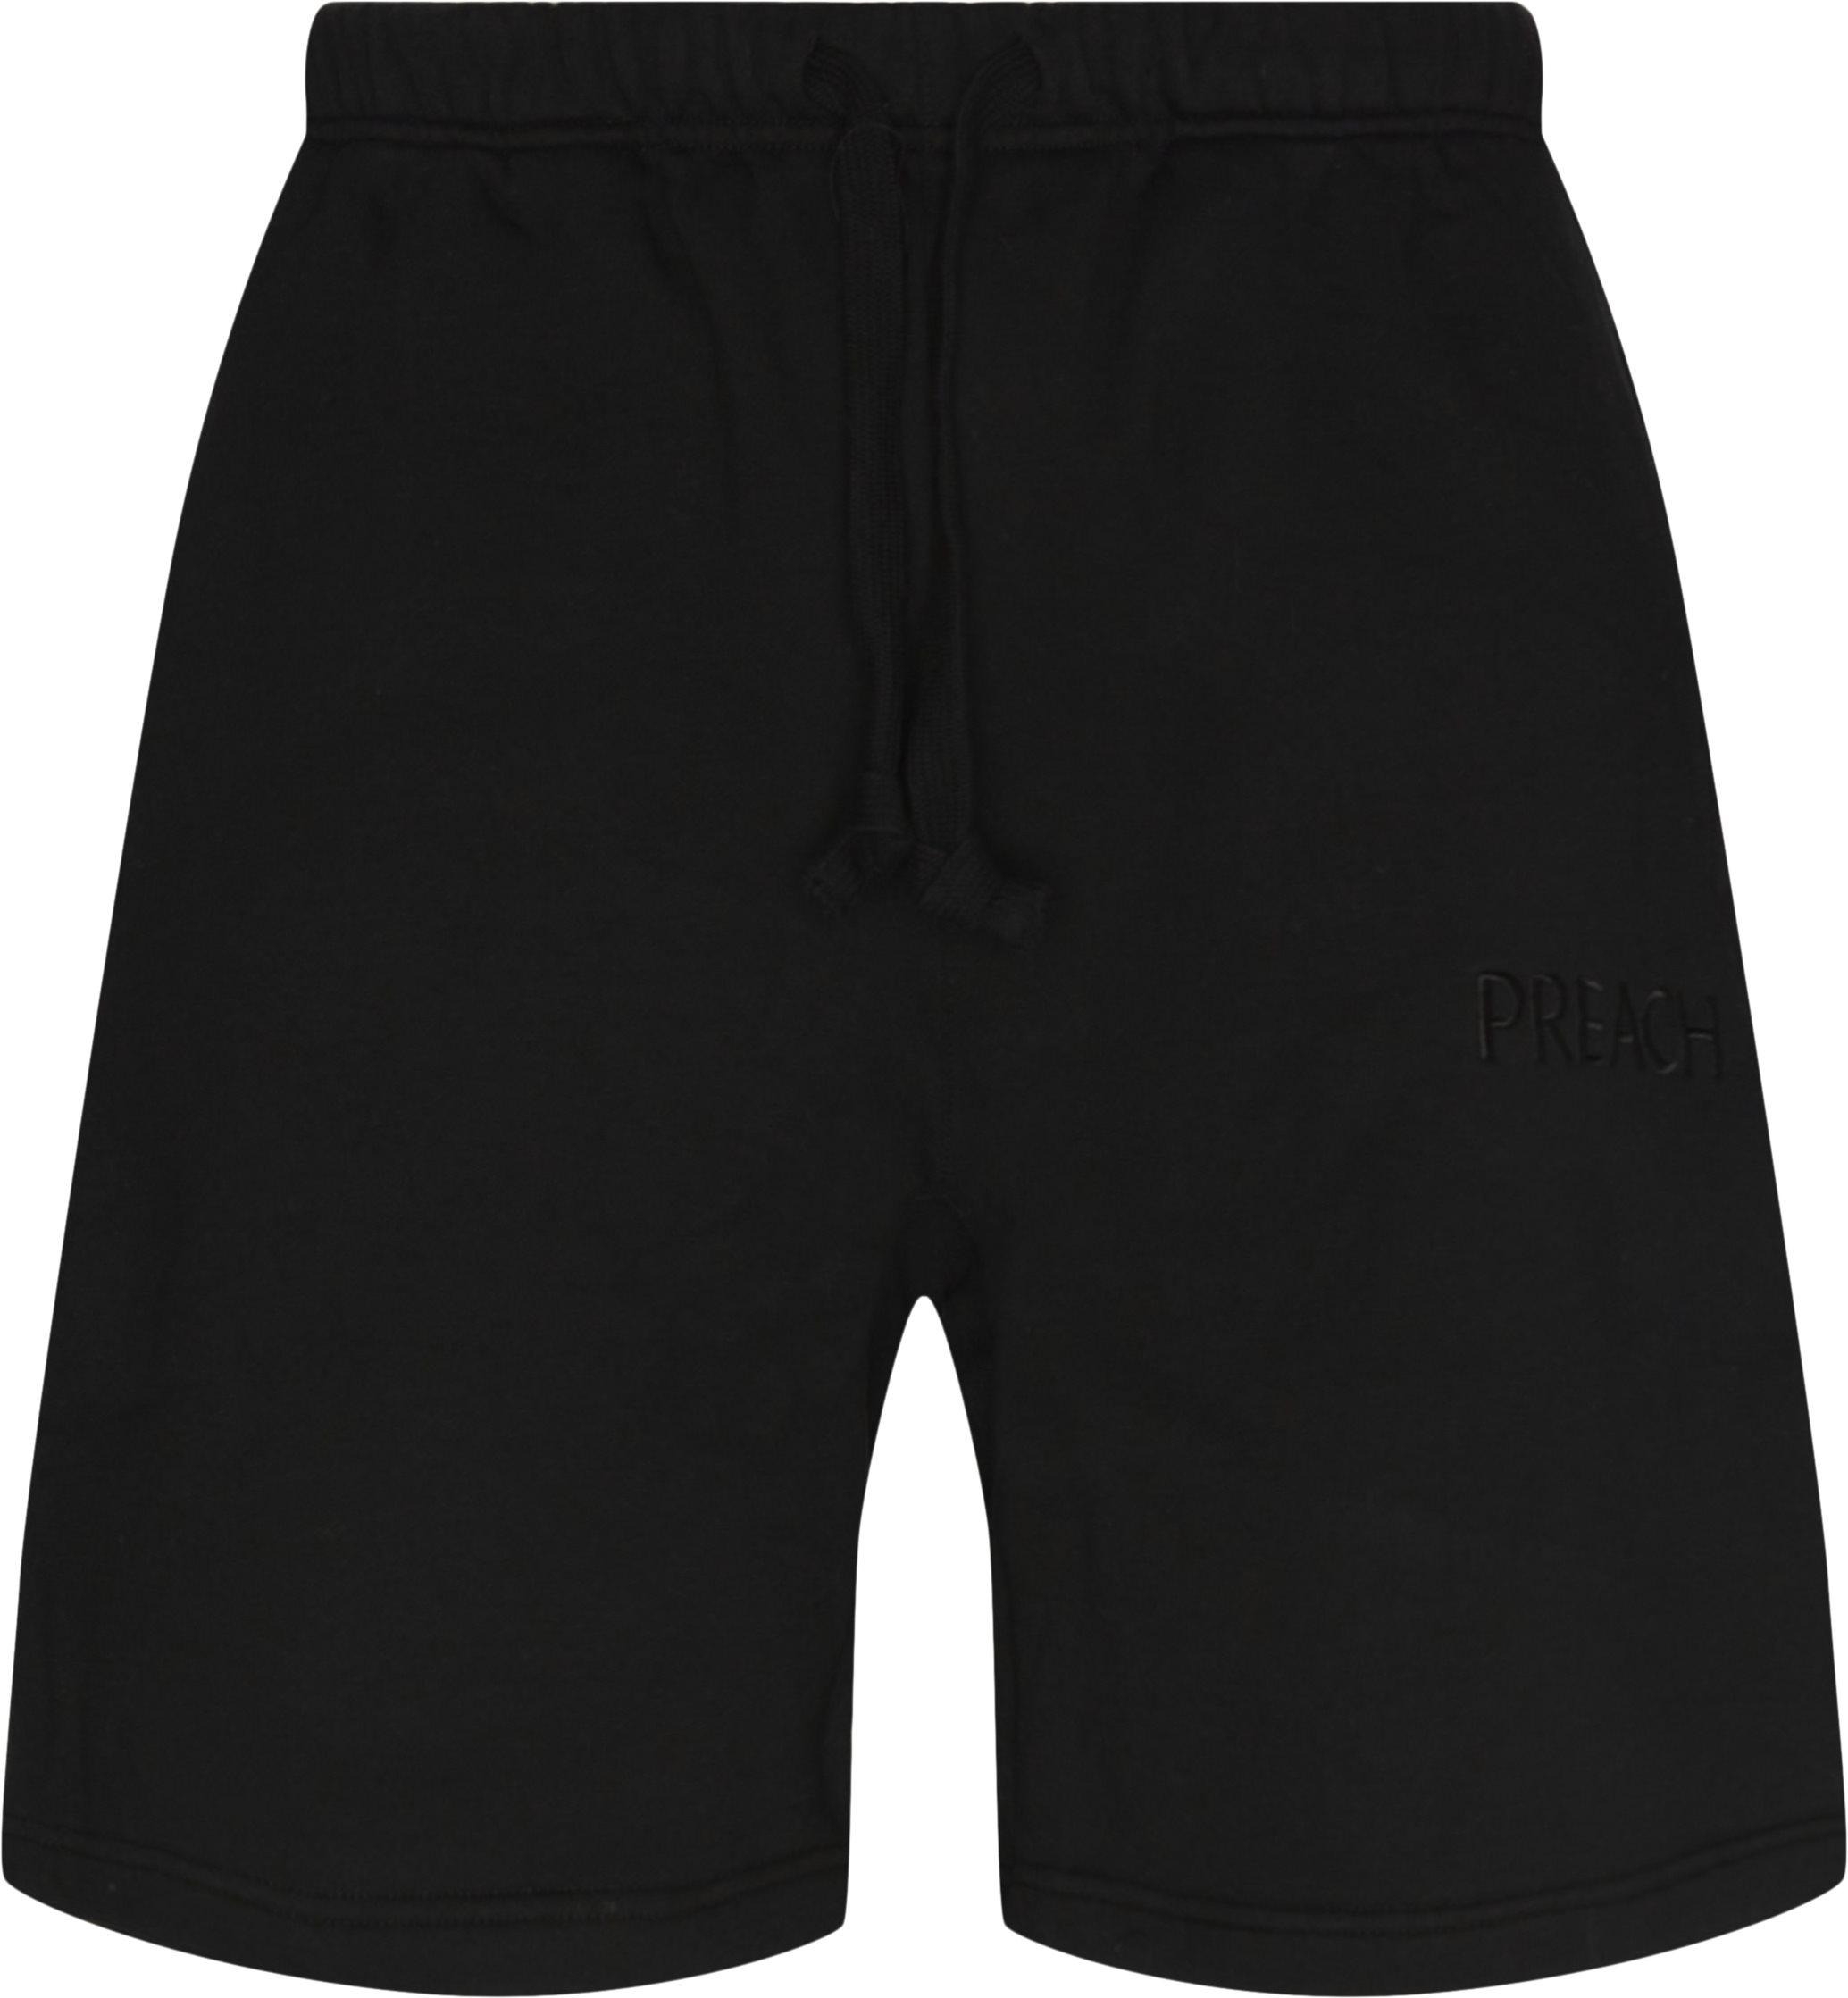 Essential Sweat Shorts - Shorts - Loose - Sort